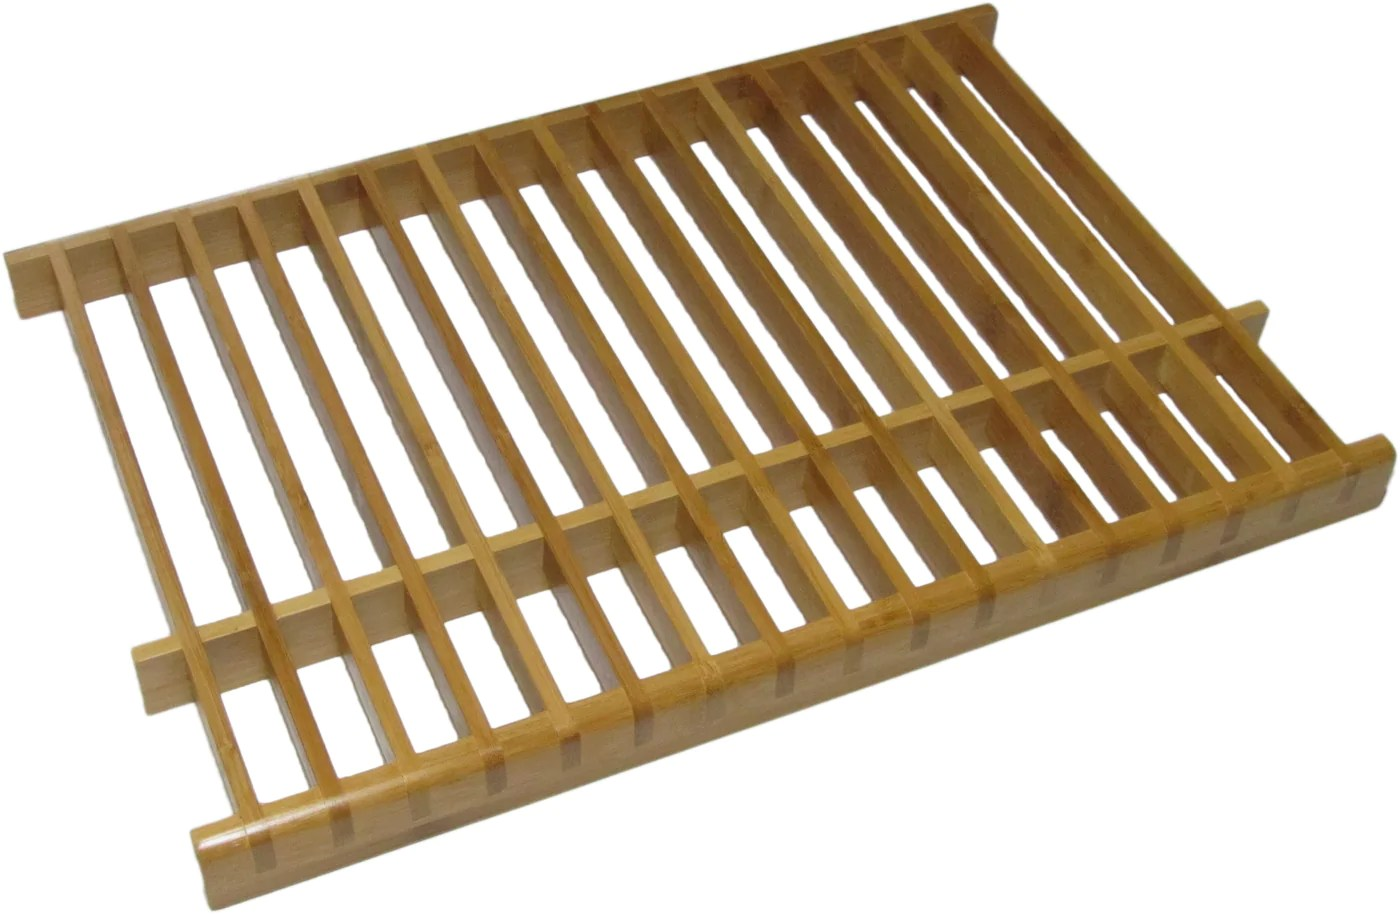 kitchenedge bamboo over the sink dish drying rack